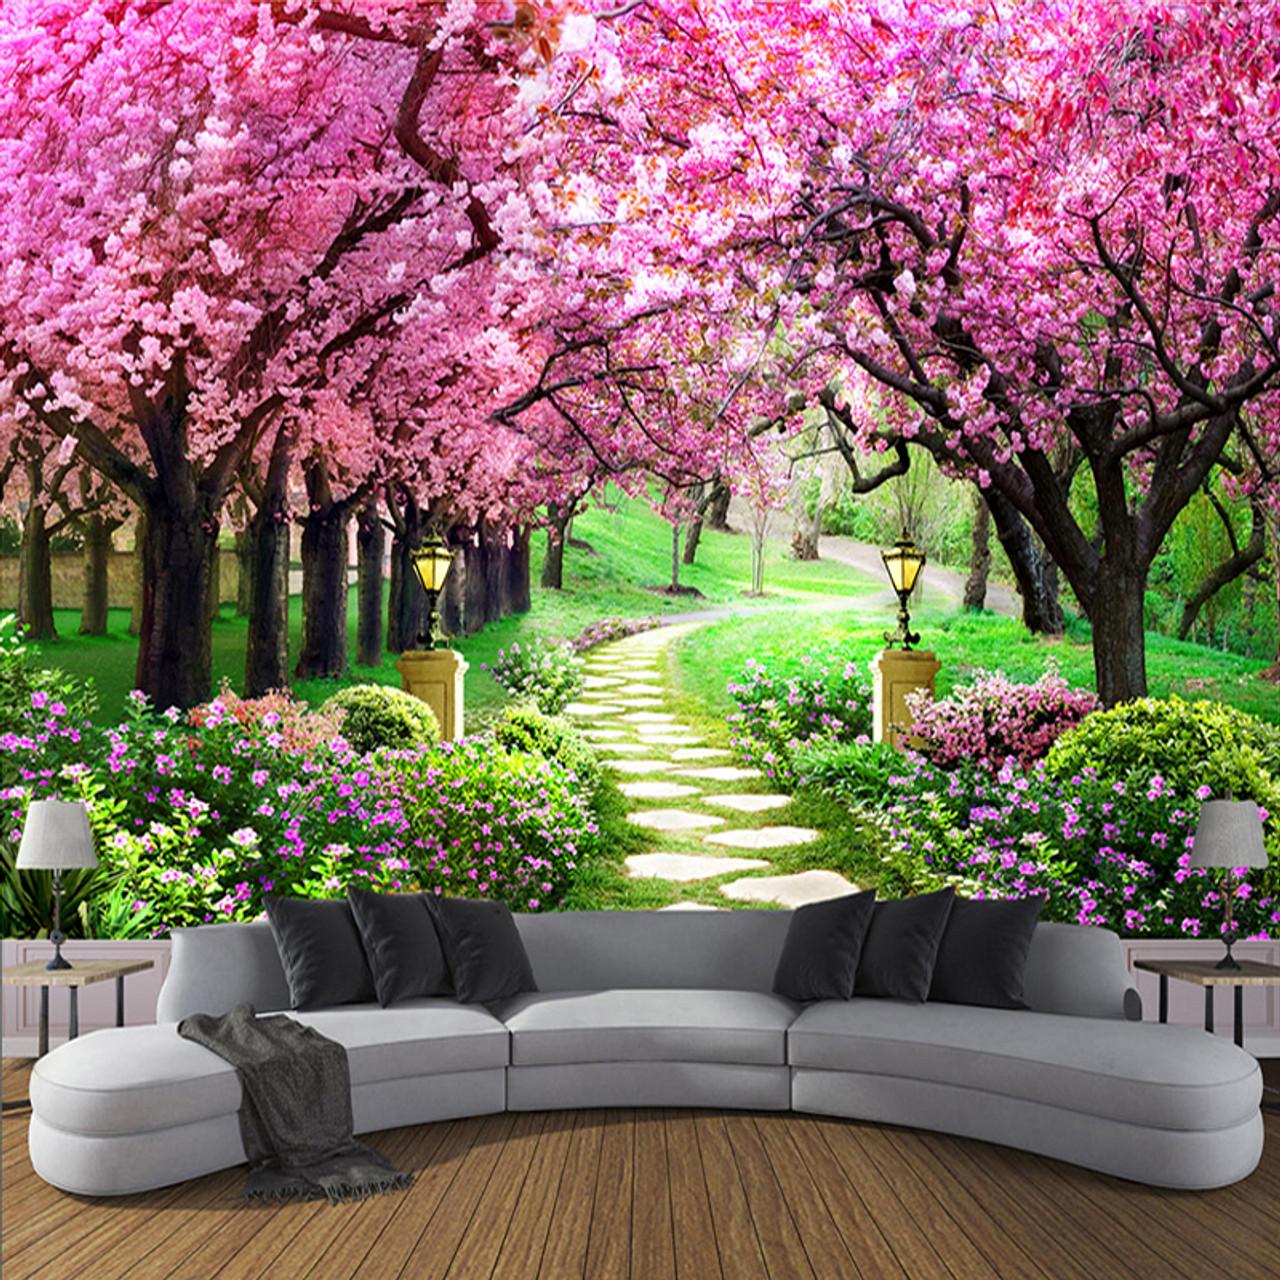 Custom 3d Photo Wallpaper Flower Romantic Cherry Blossom Tree